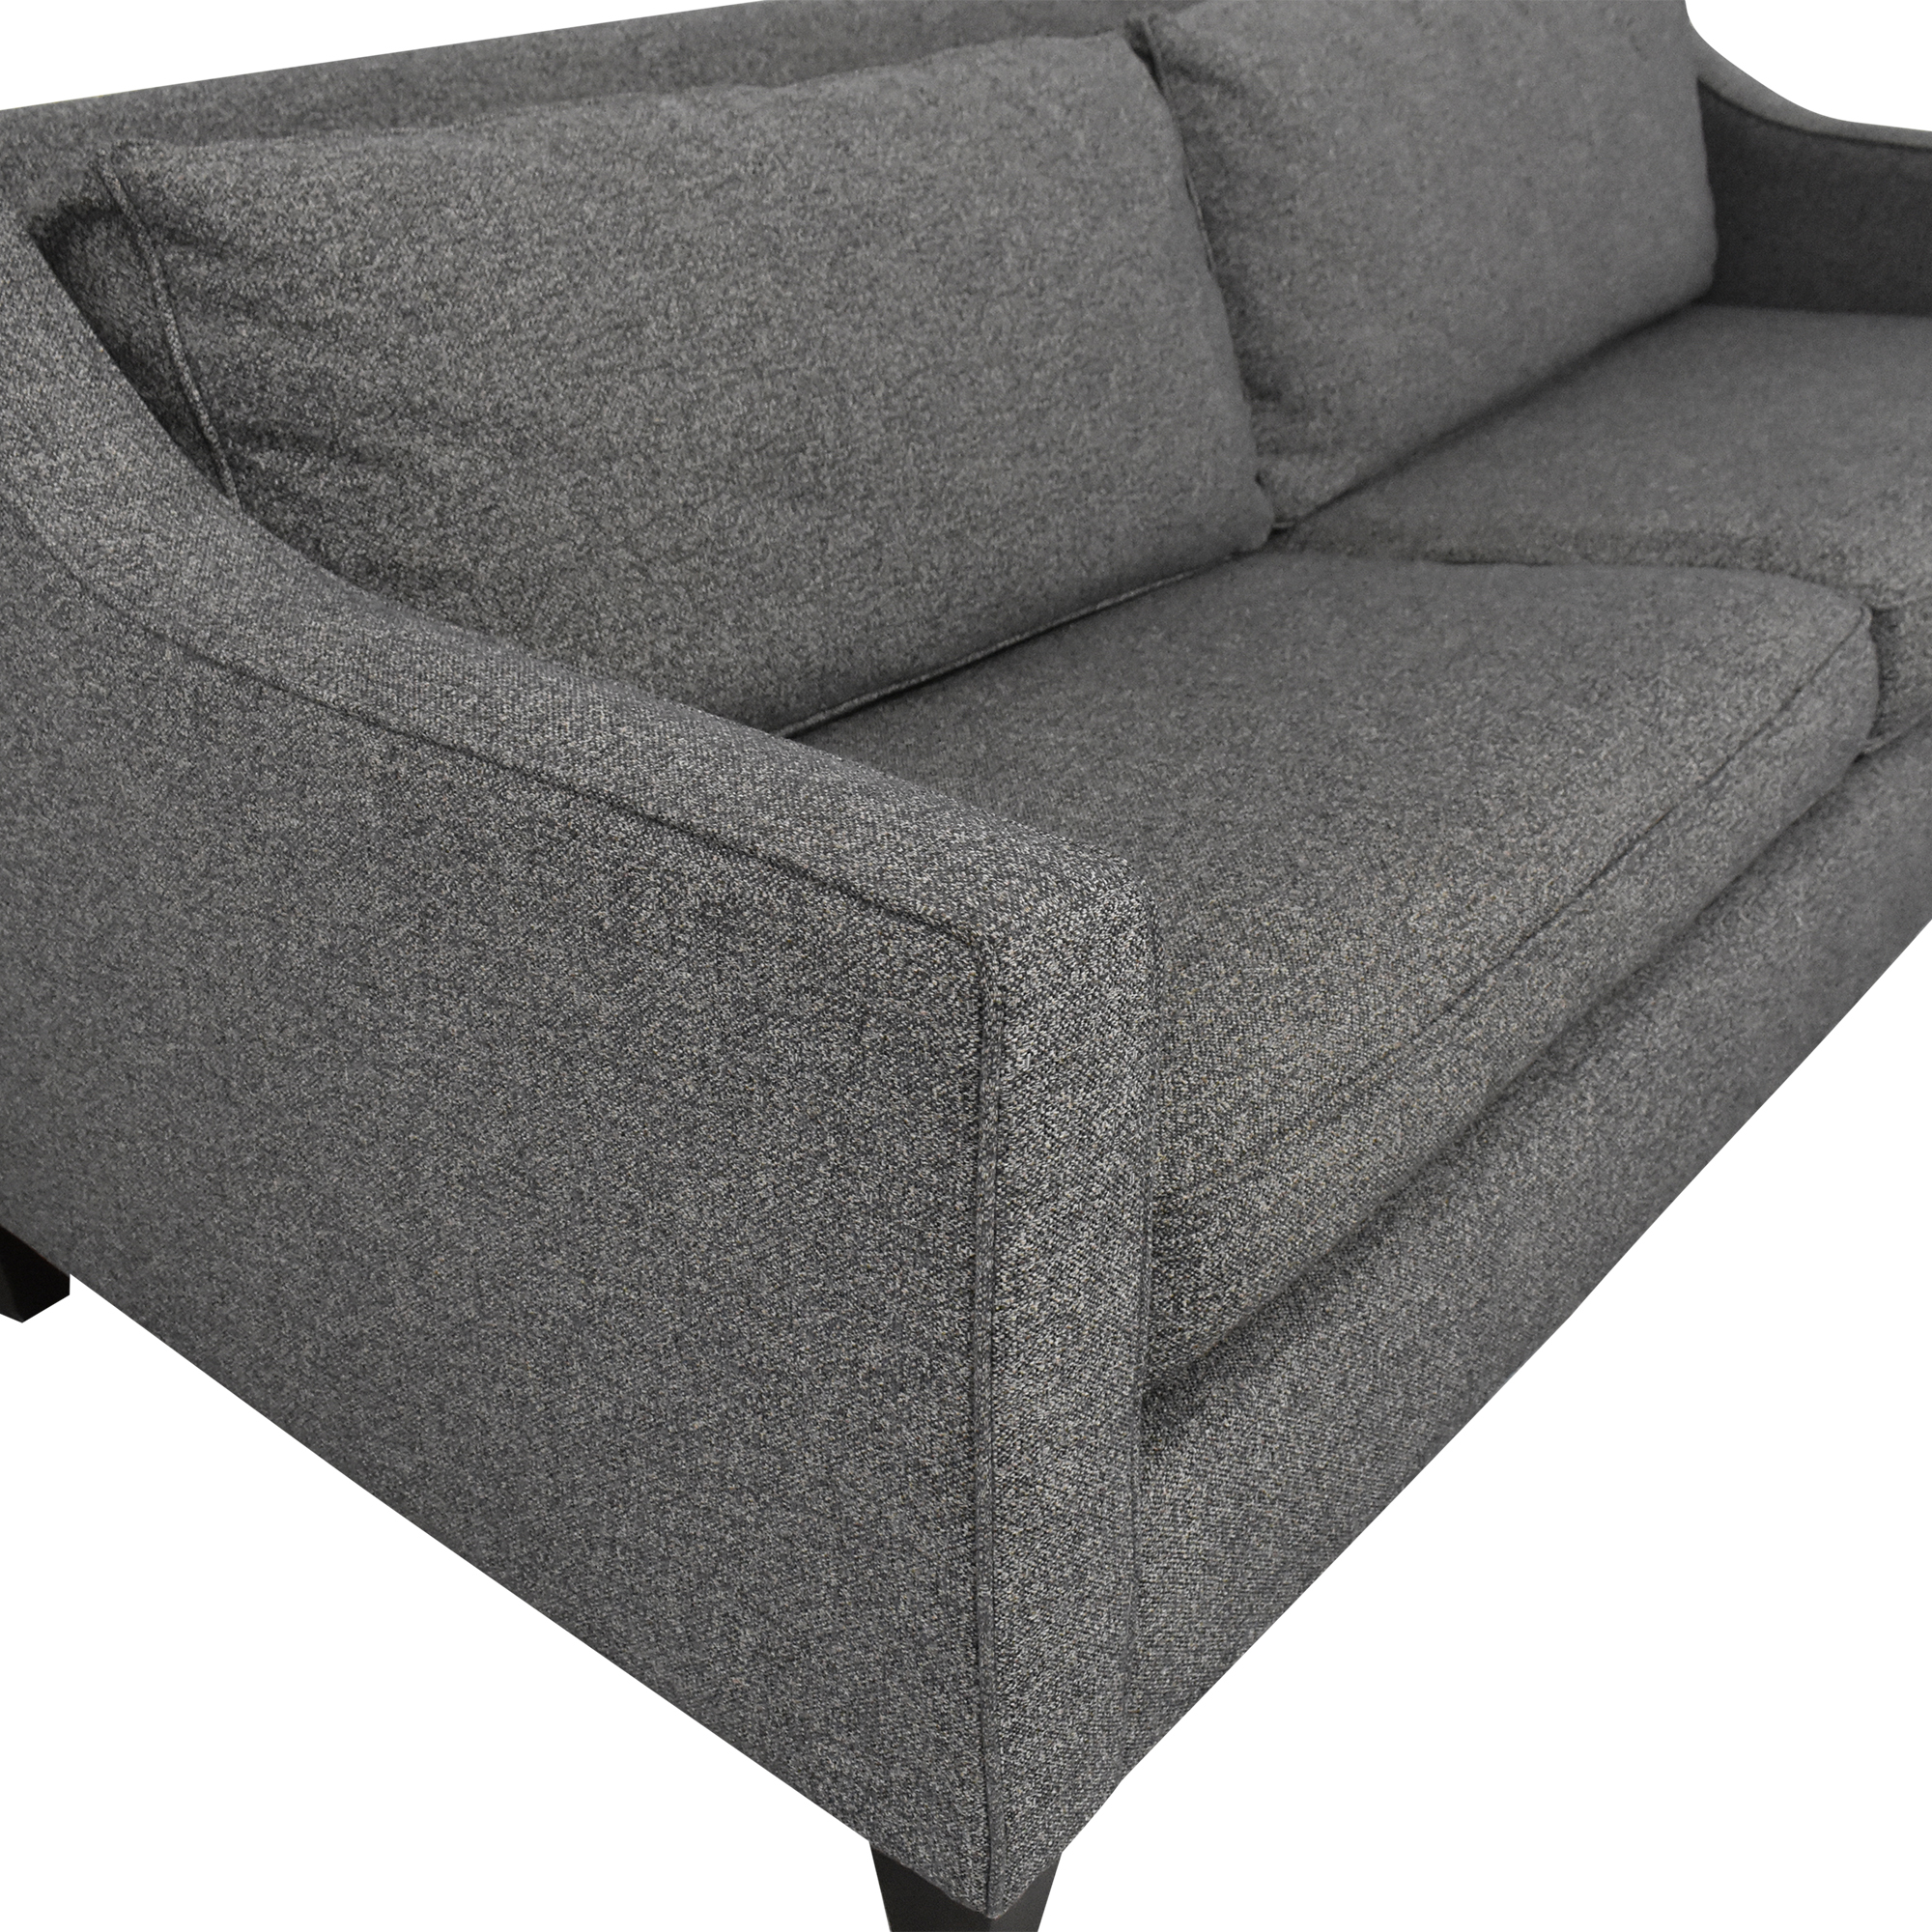 buy West Elm Paidge Sleeper Sofa West Elm Sofas